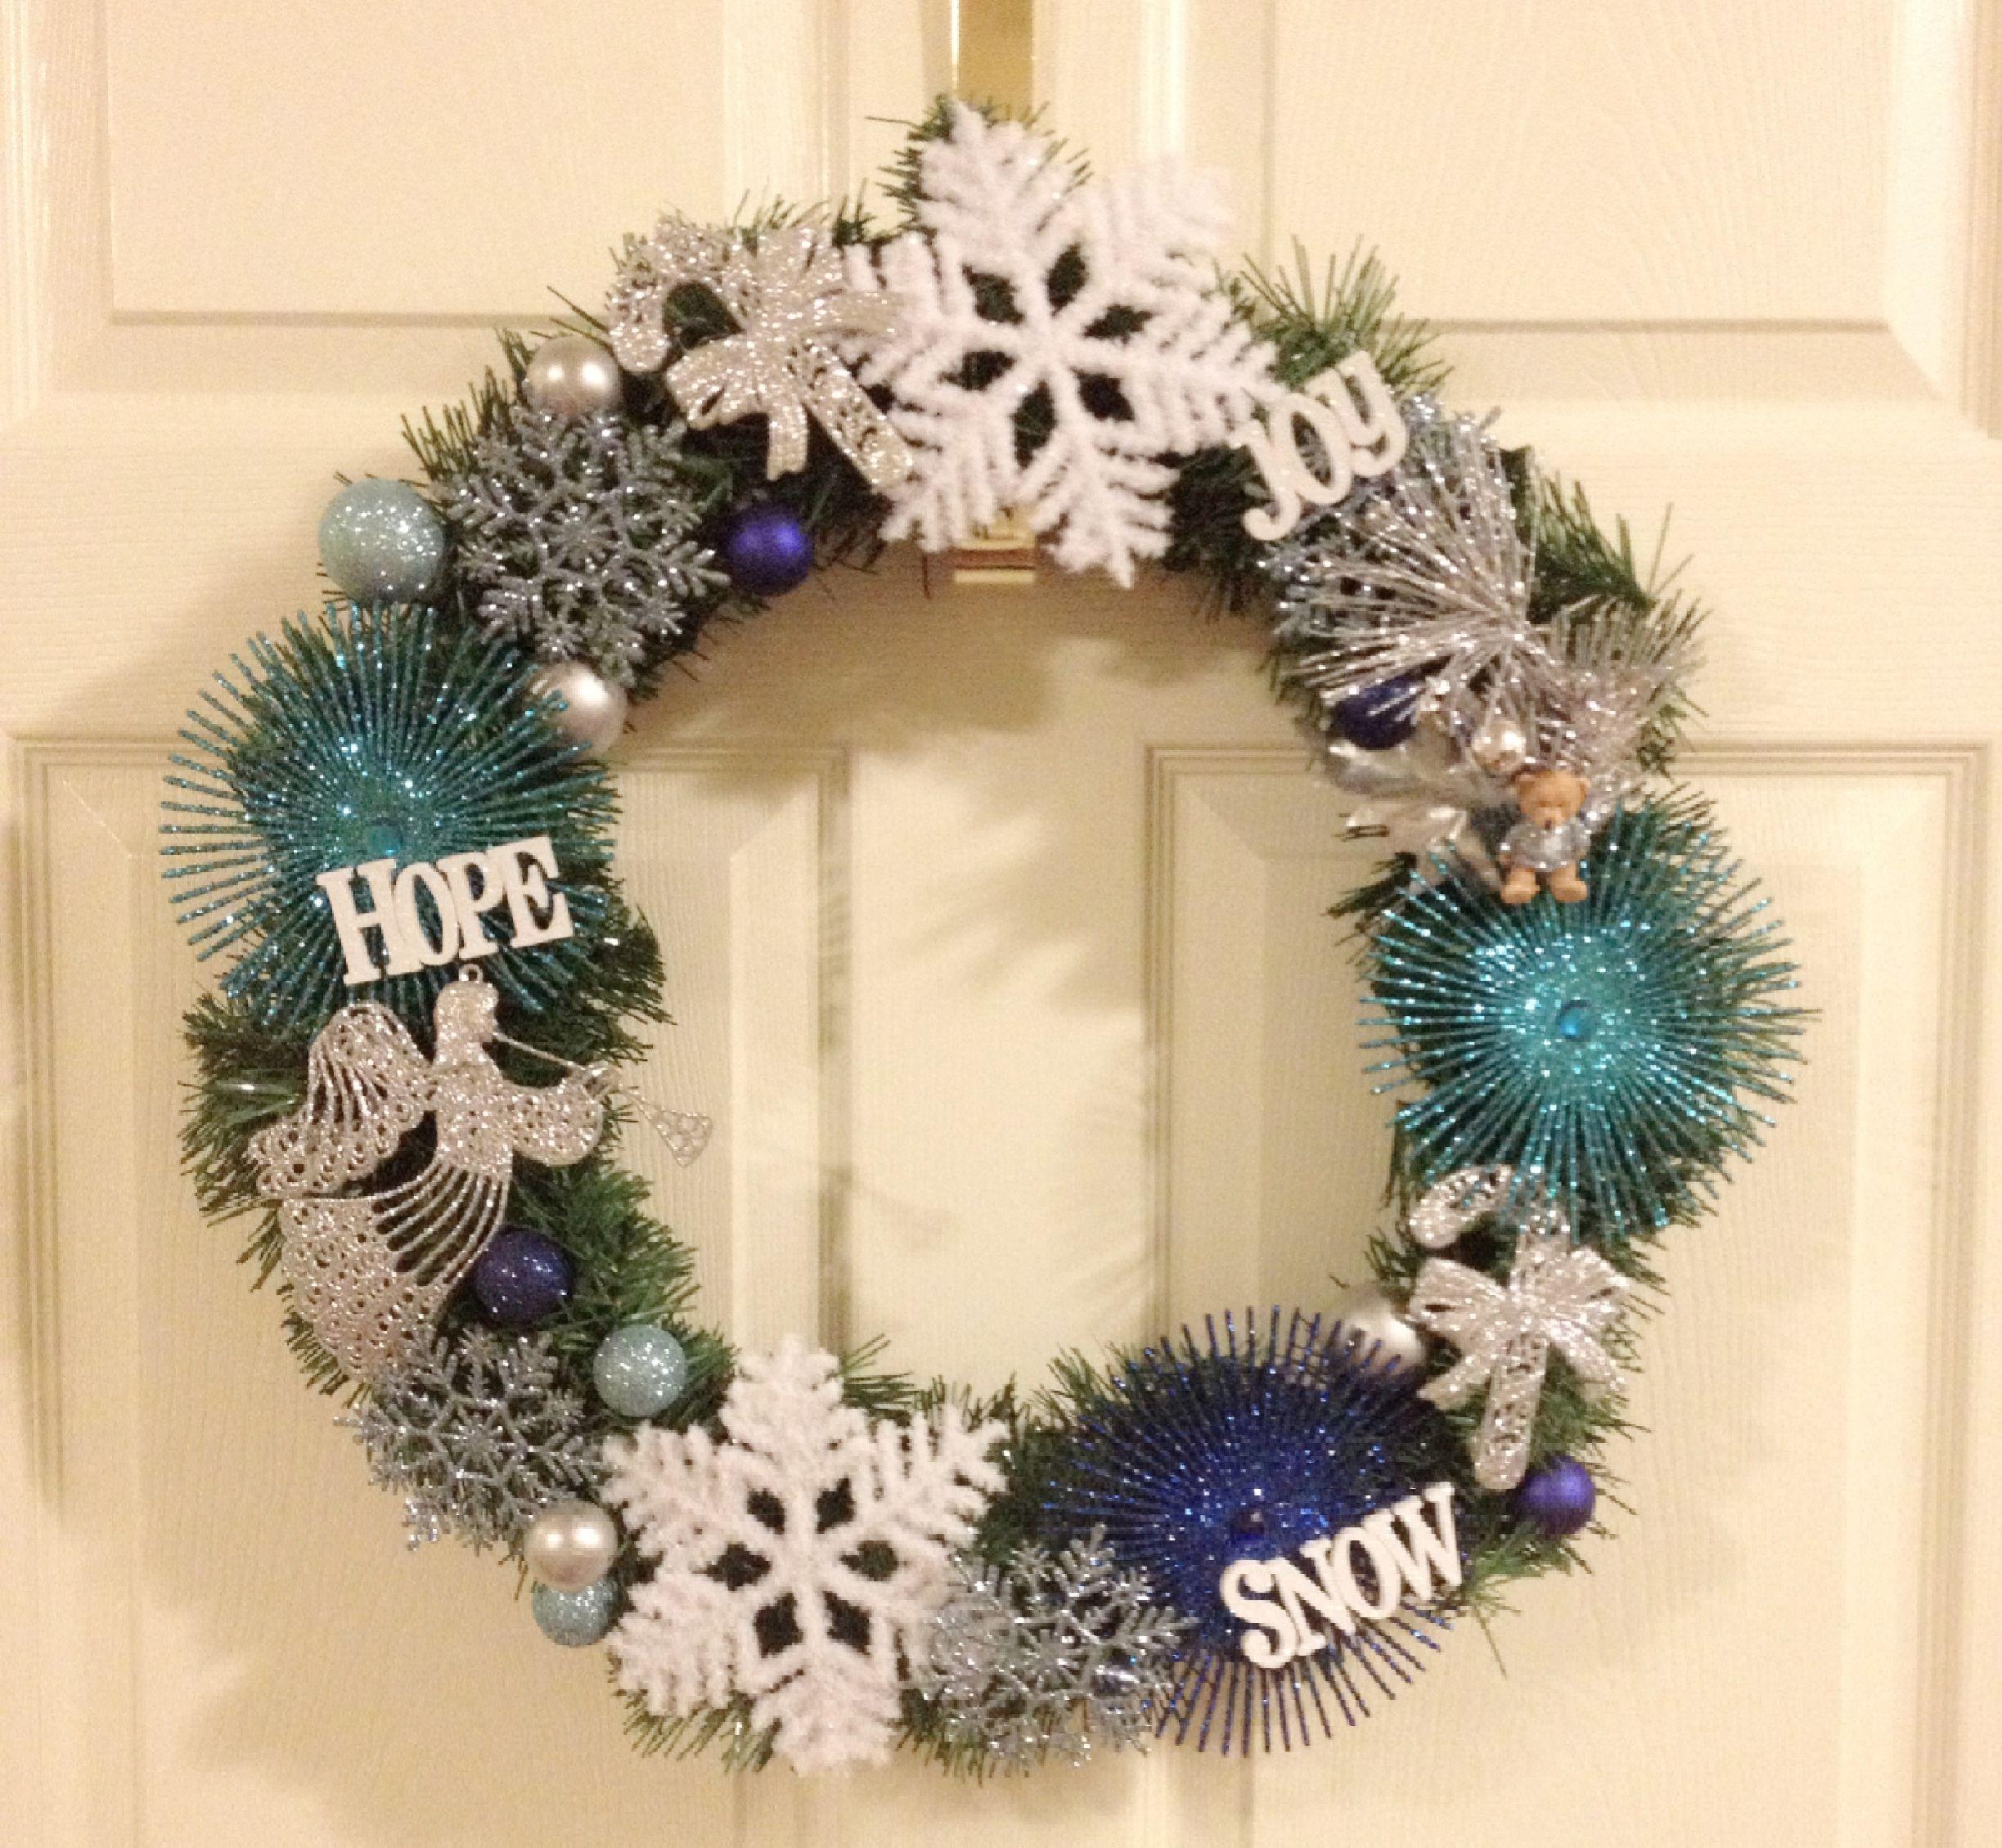 Winter wonderland wreath snowflakes holiday wreath diy my diy winter wonderland wreath snowflakes holiday wreath diy solutioingenieria Gallery